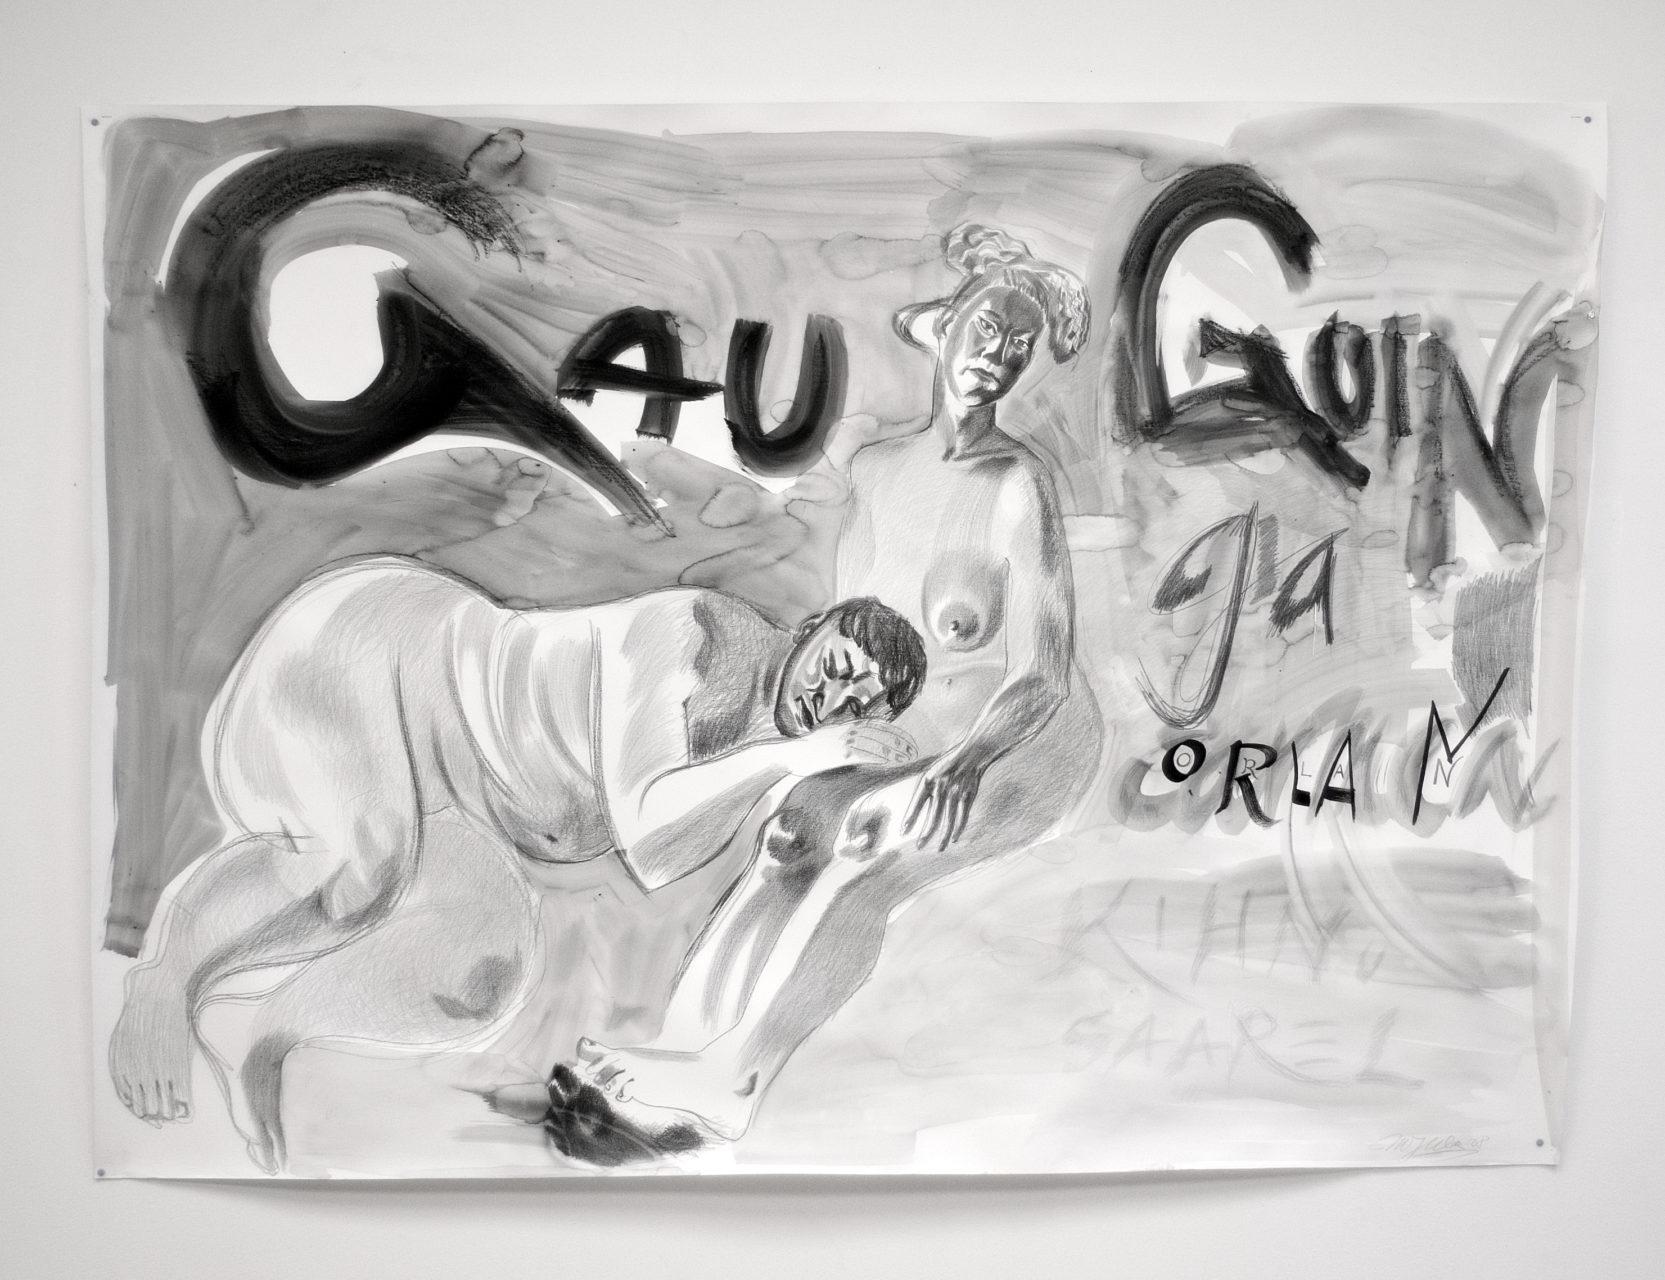 Gauguin & Orlan